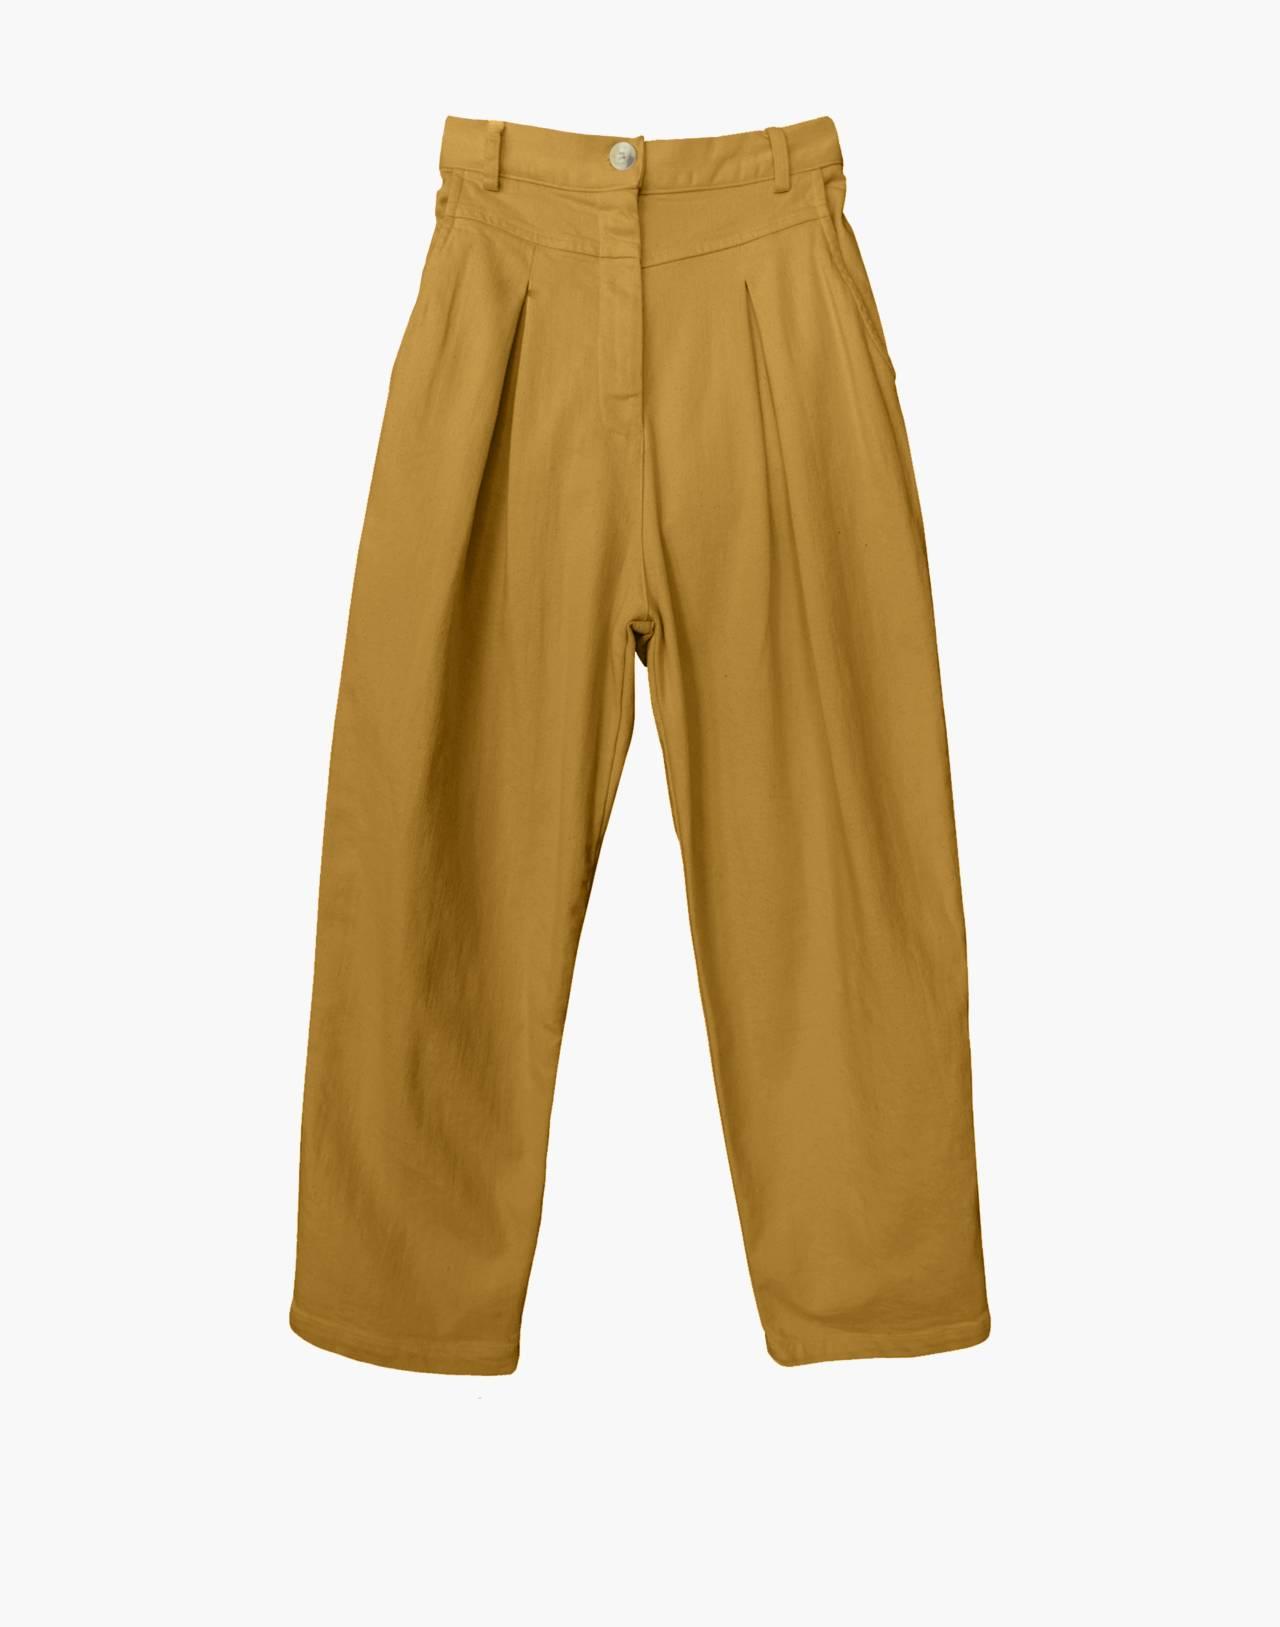 NICO NICO™ Jet Pleated Jeans in yellow image 1